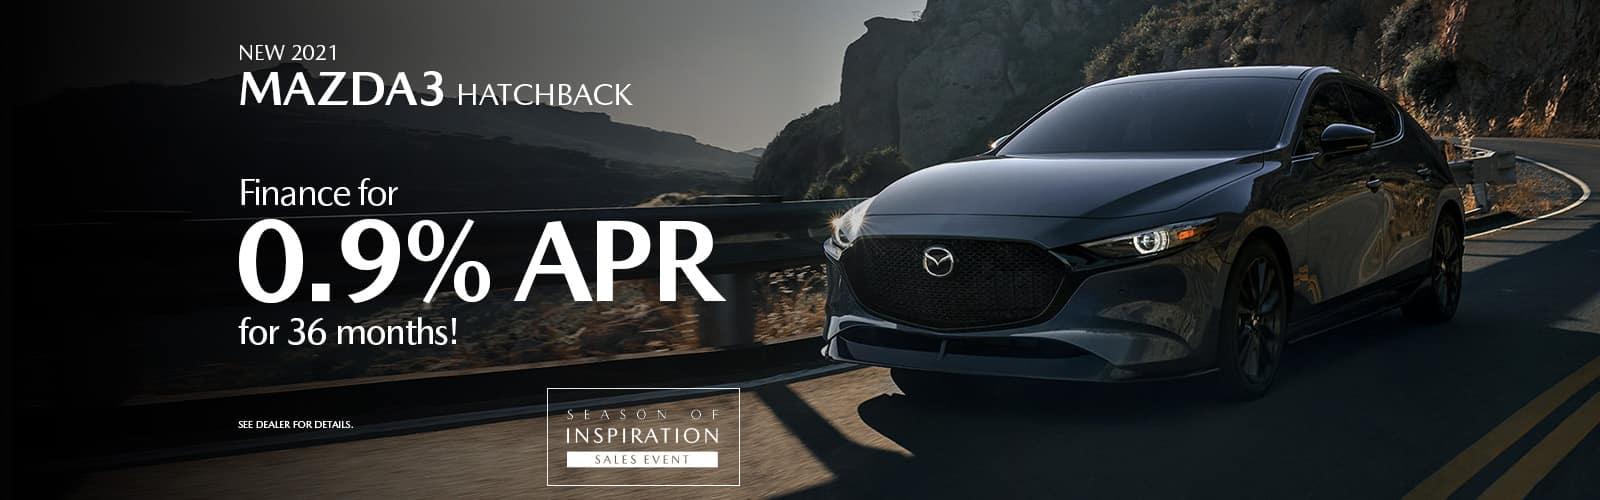 2021 Mazda 3 Hatchback